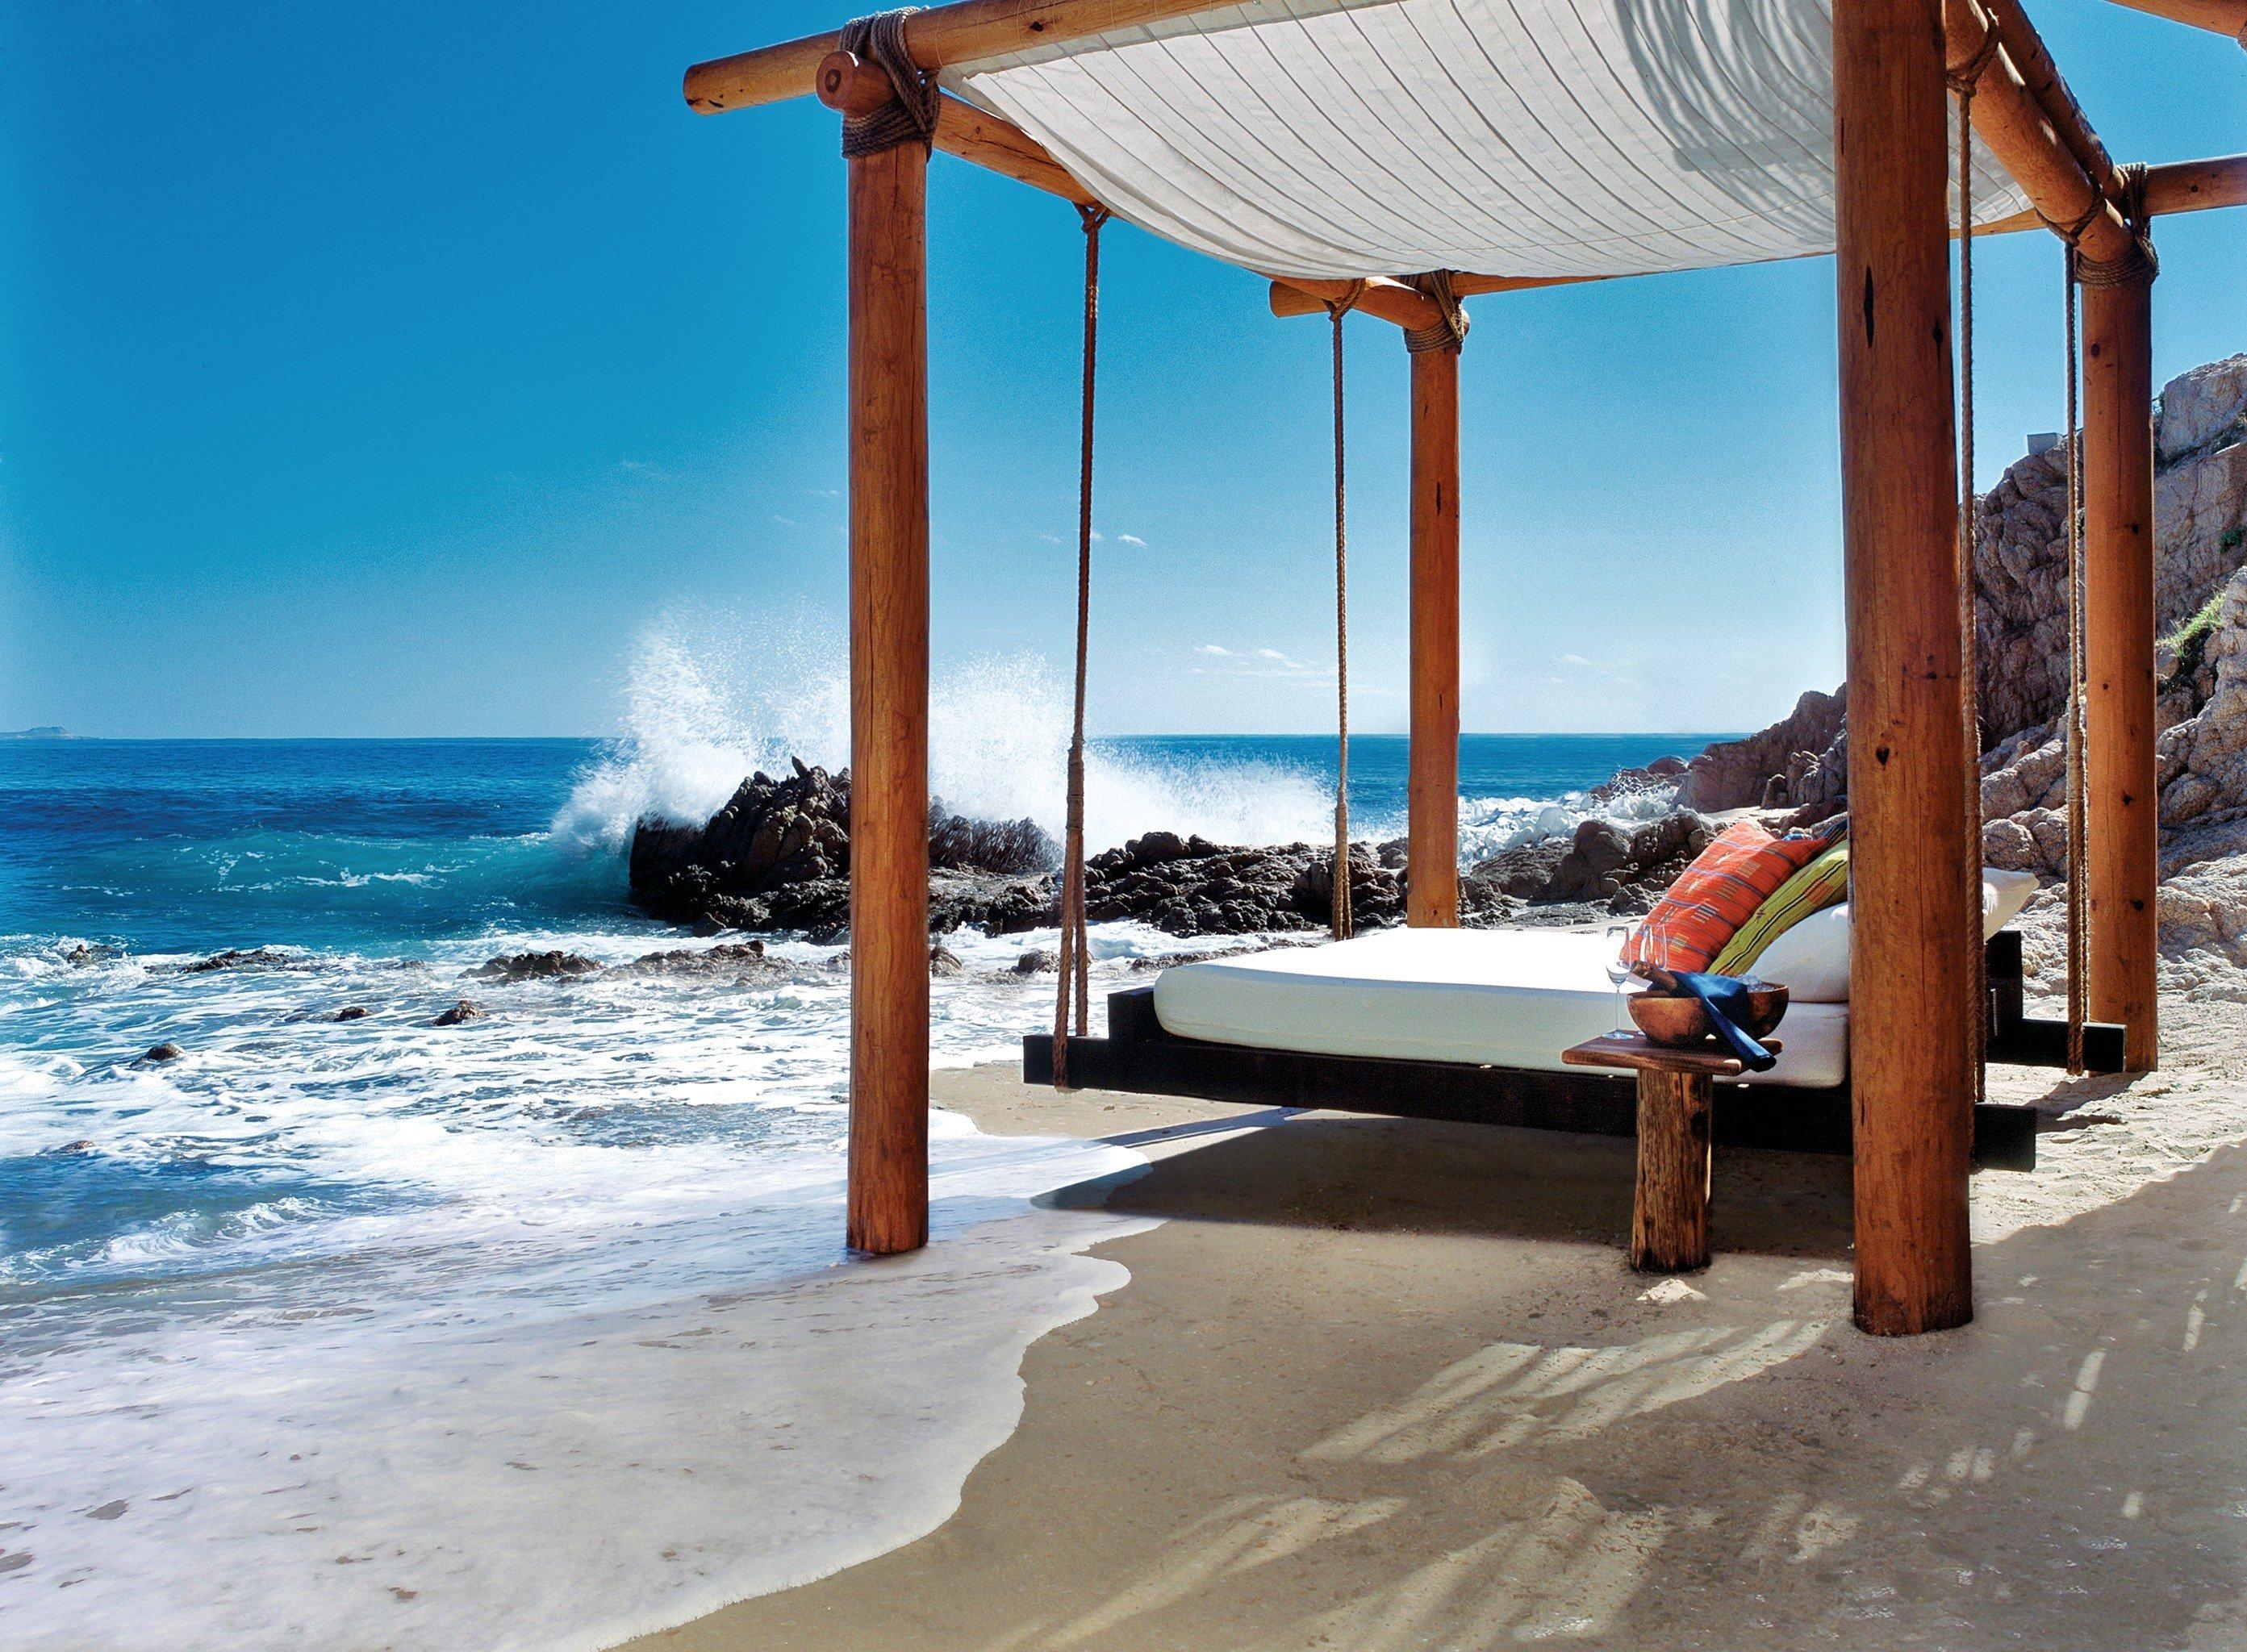 Hotels sky Beach outdoor leisure vacation Ocean Sea Resort caribbean swimming pool estate walkway shore sandy